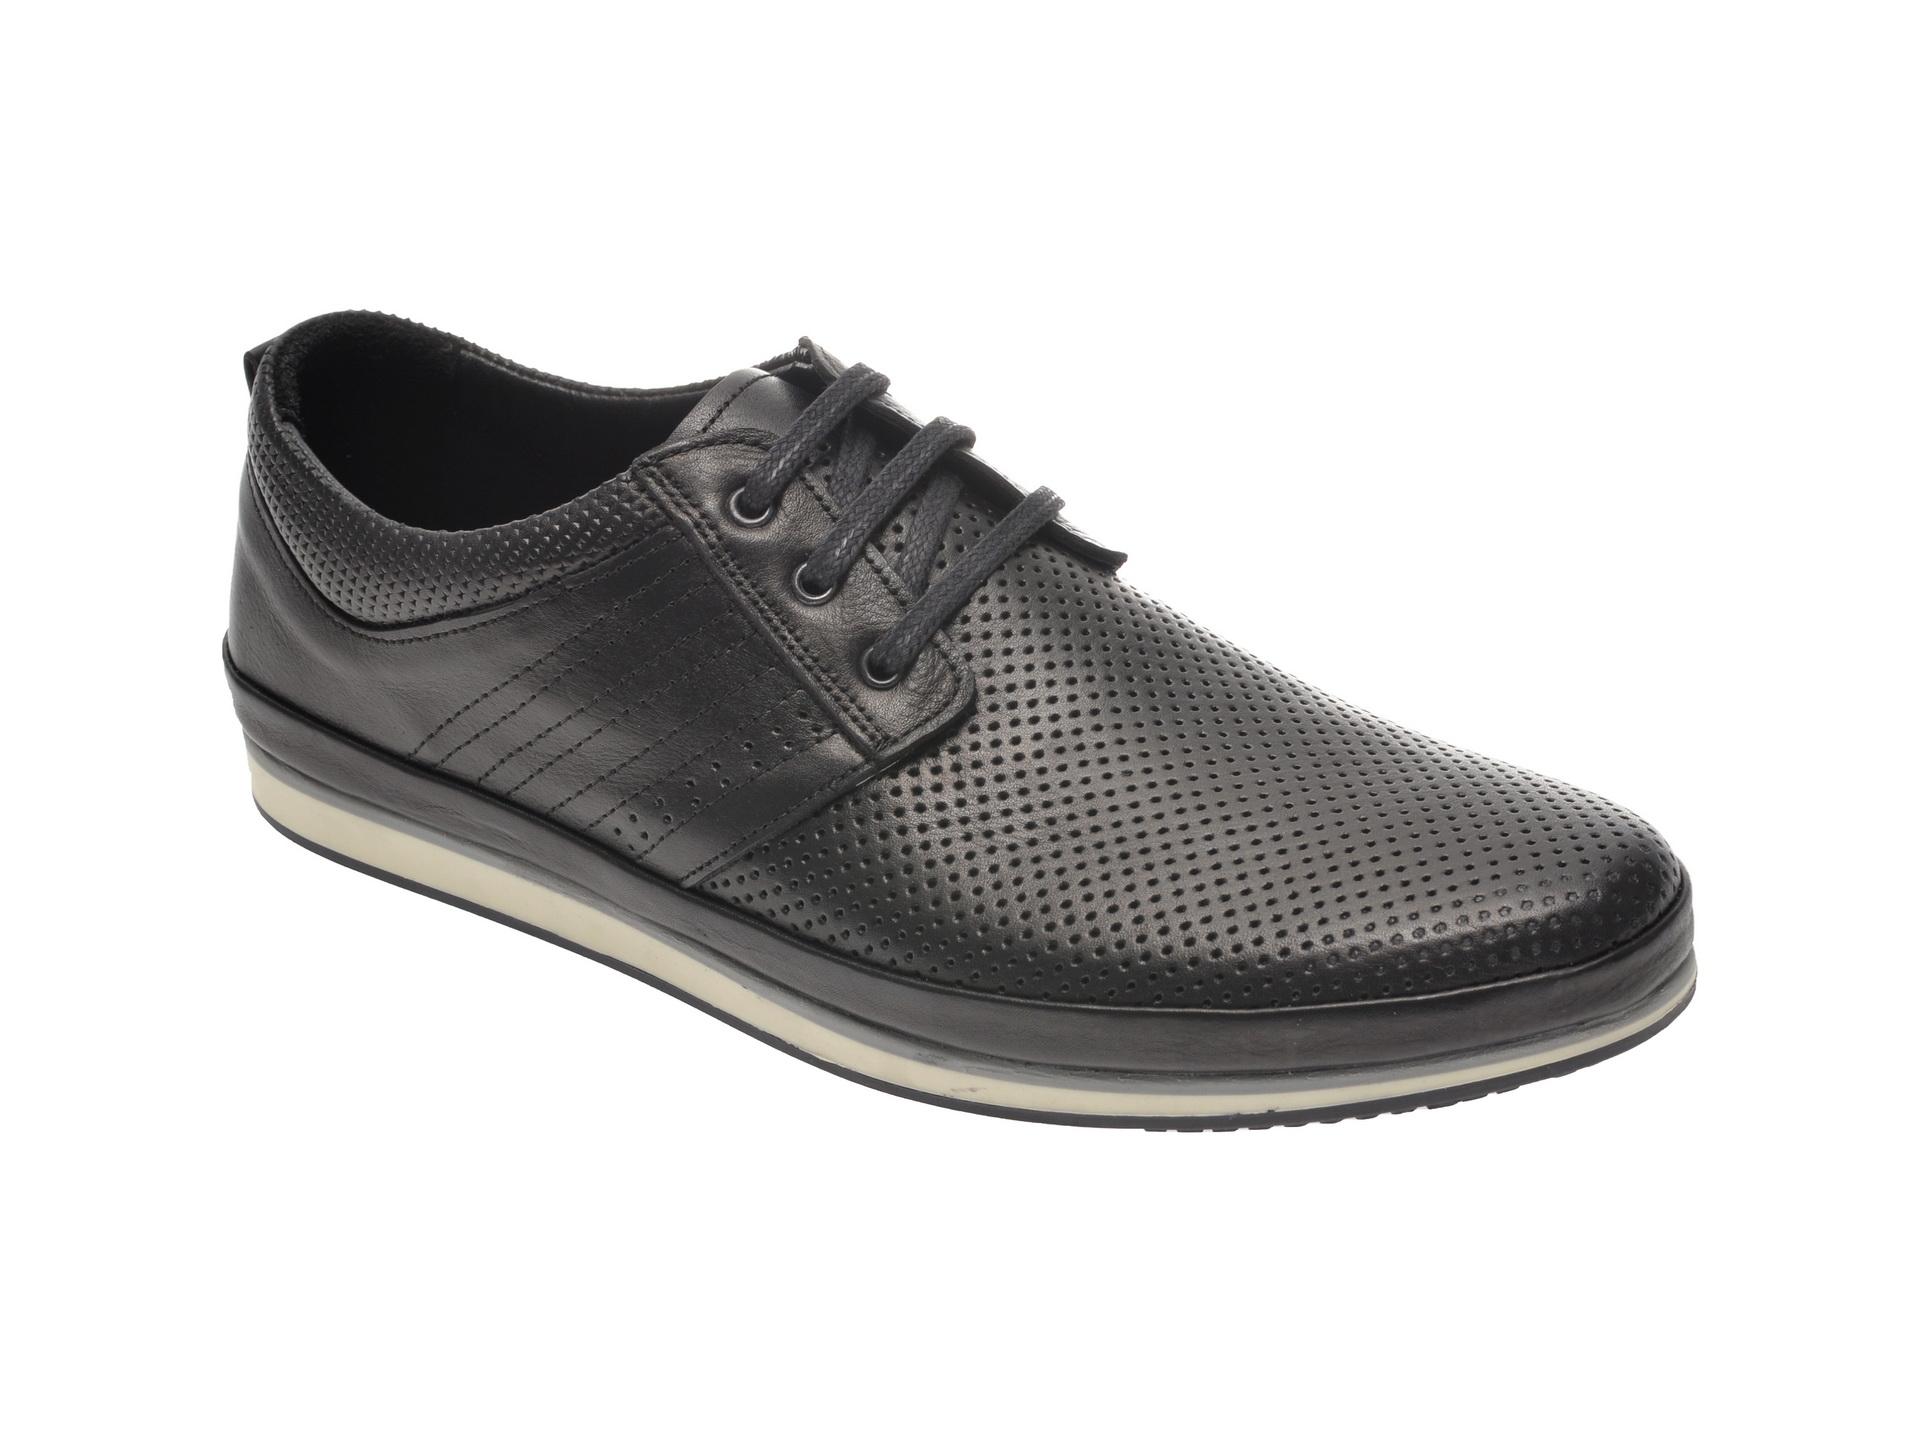 Pantofi OTTER negri, M4409, din piele naturala imagine